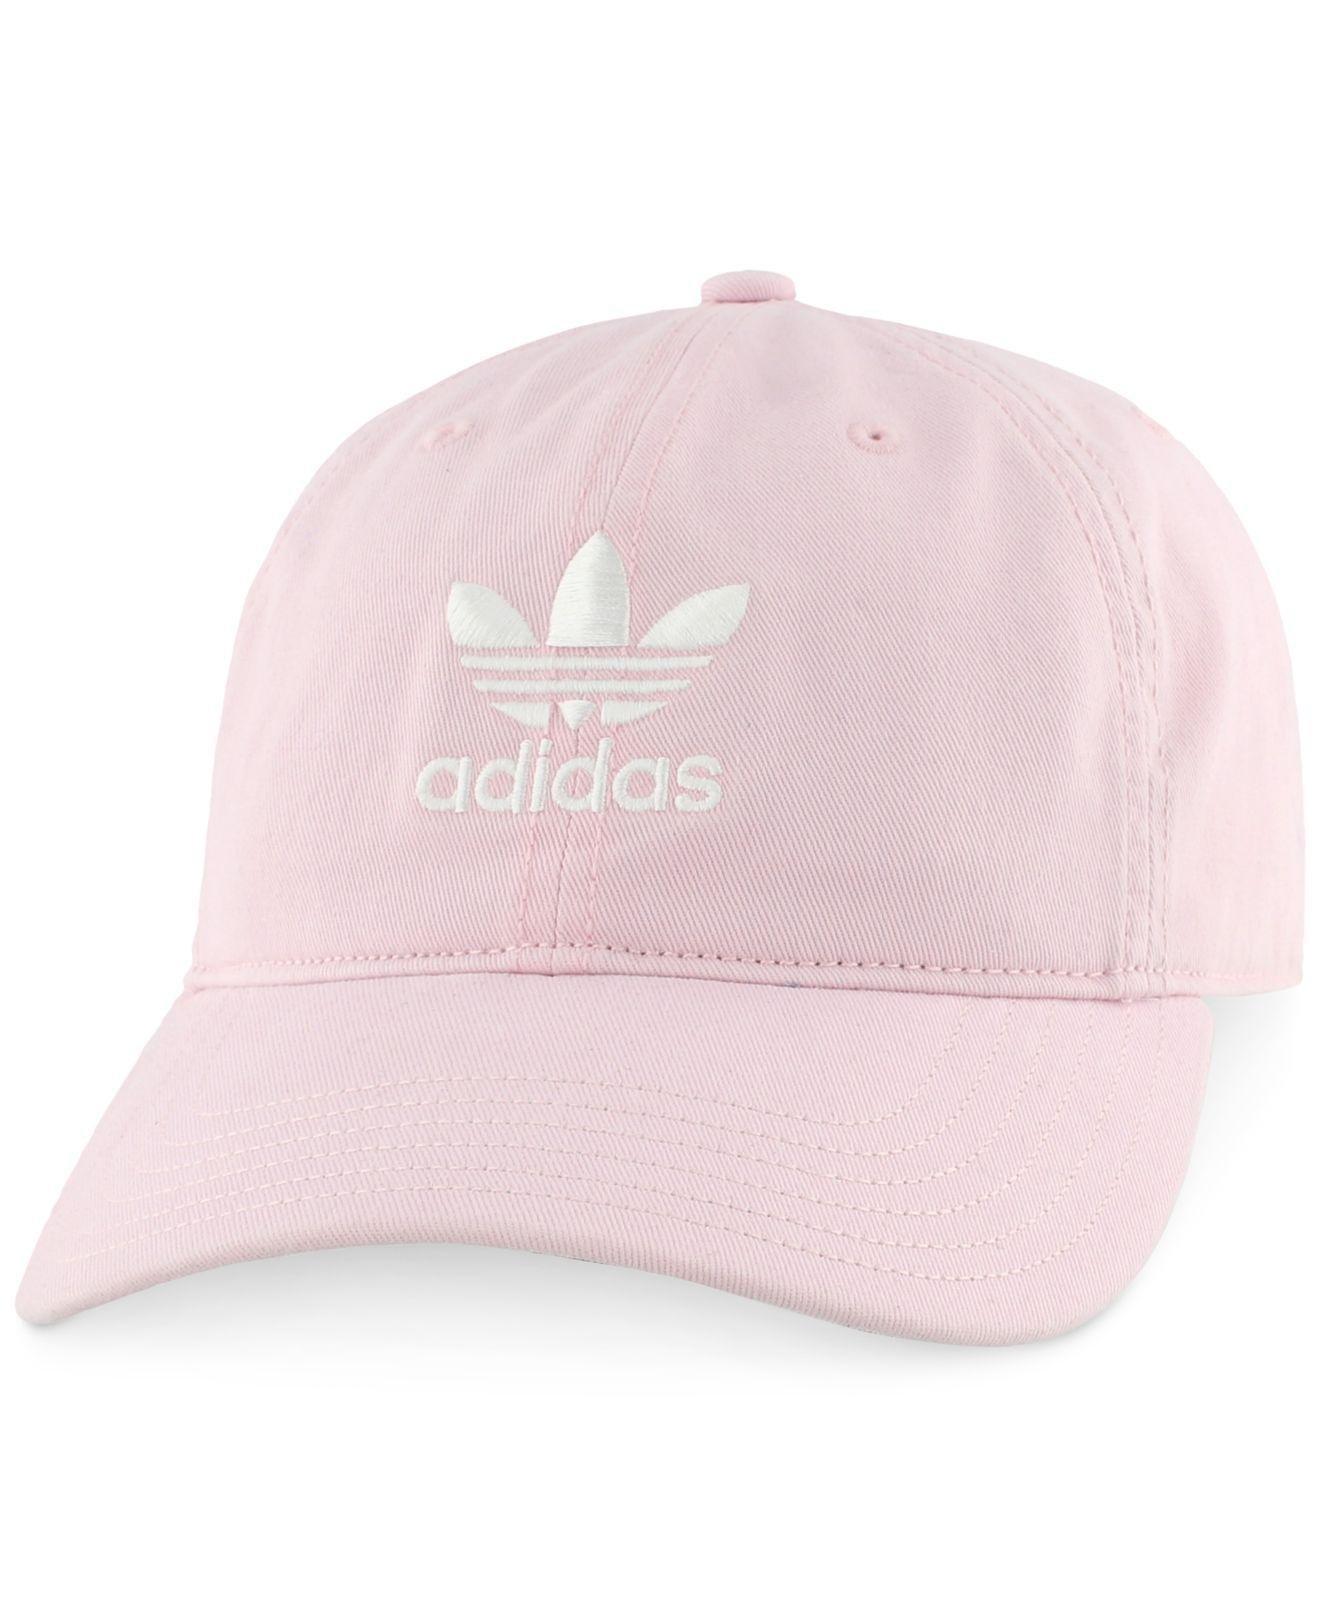 Lyst - Adidas Originals Relaxed Six-panel Cap in Pink for Men adbdec740118